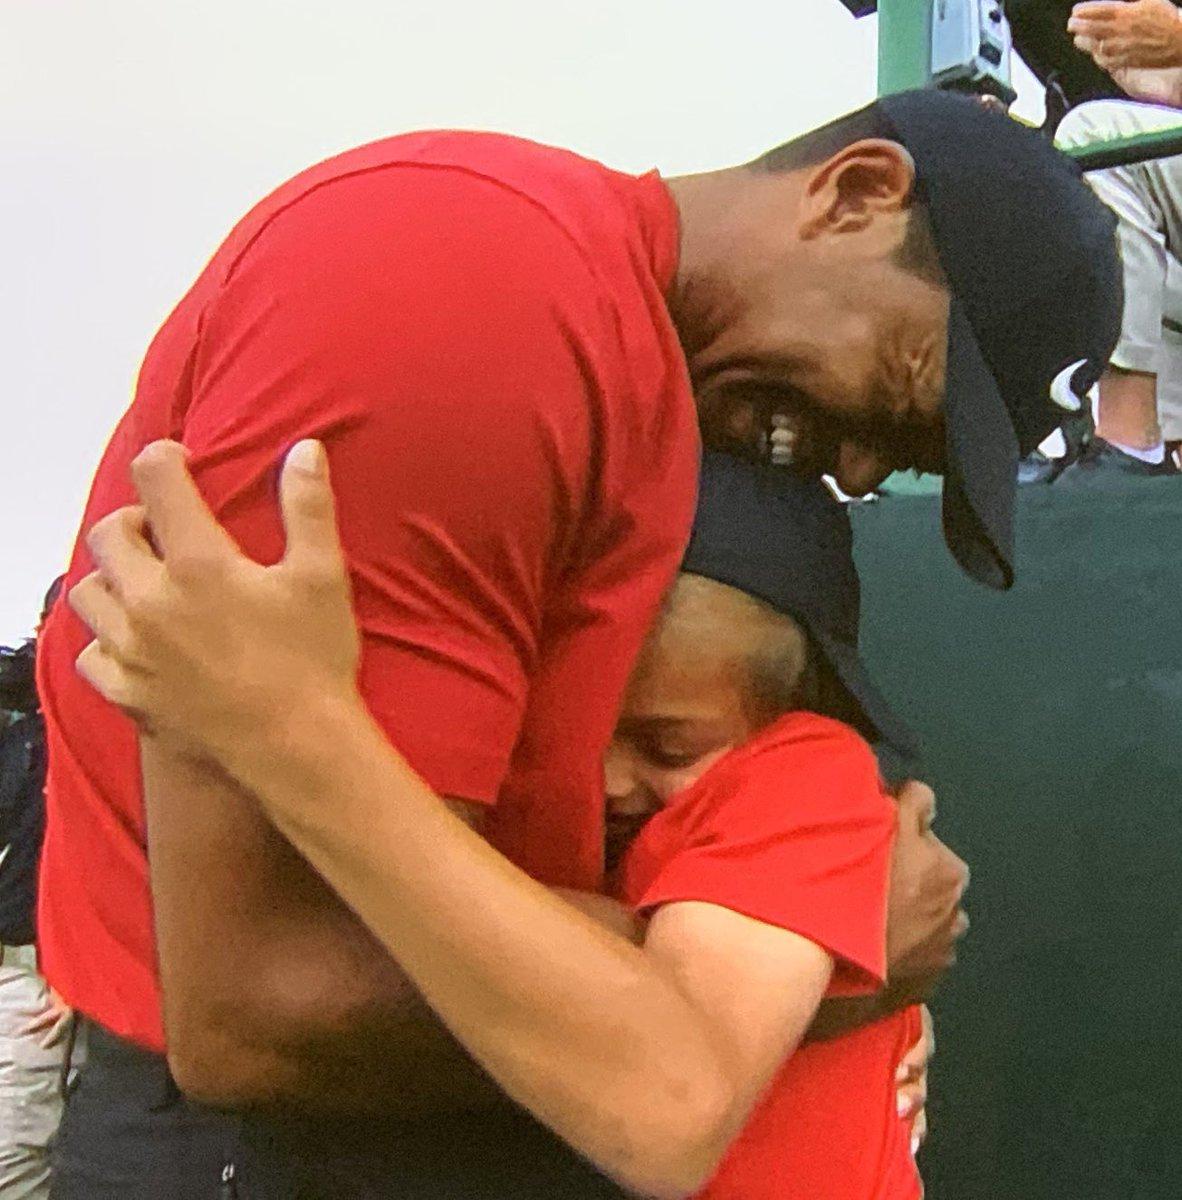 Tiger Woods when he wins Vs Tom Brady when he wins <br>http://pic.twitter.com/MC7iDZ3Ezo